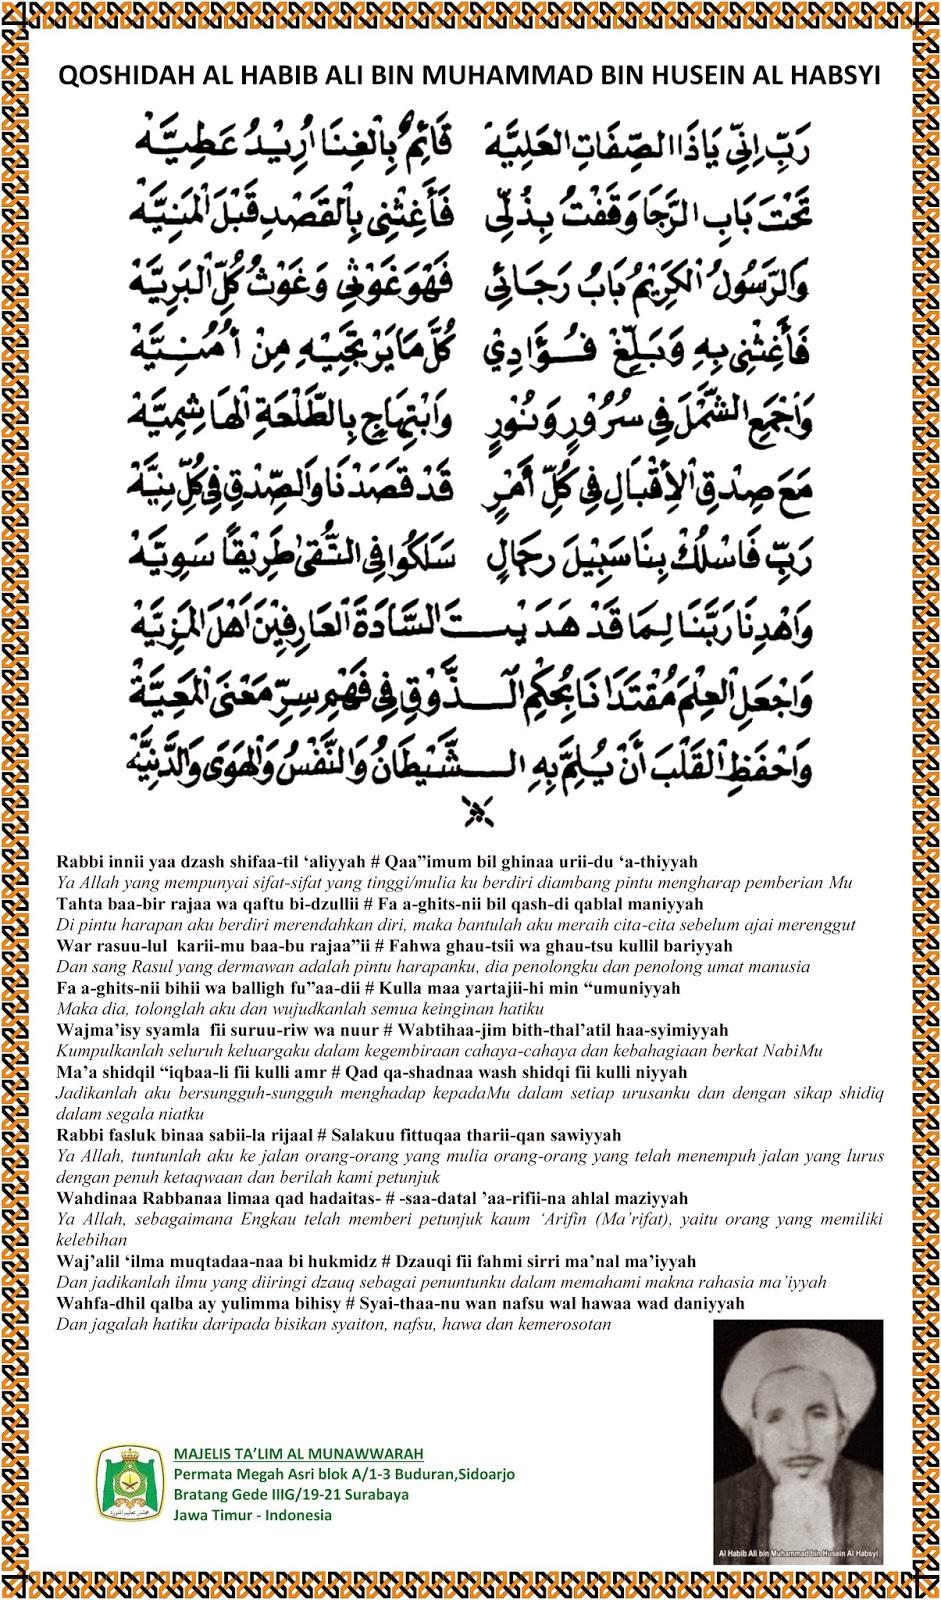 Qashidah Al Habib Ali Bin Muhammad Bin Husein Al Habsyi Majelis Ta